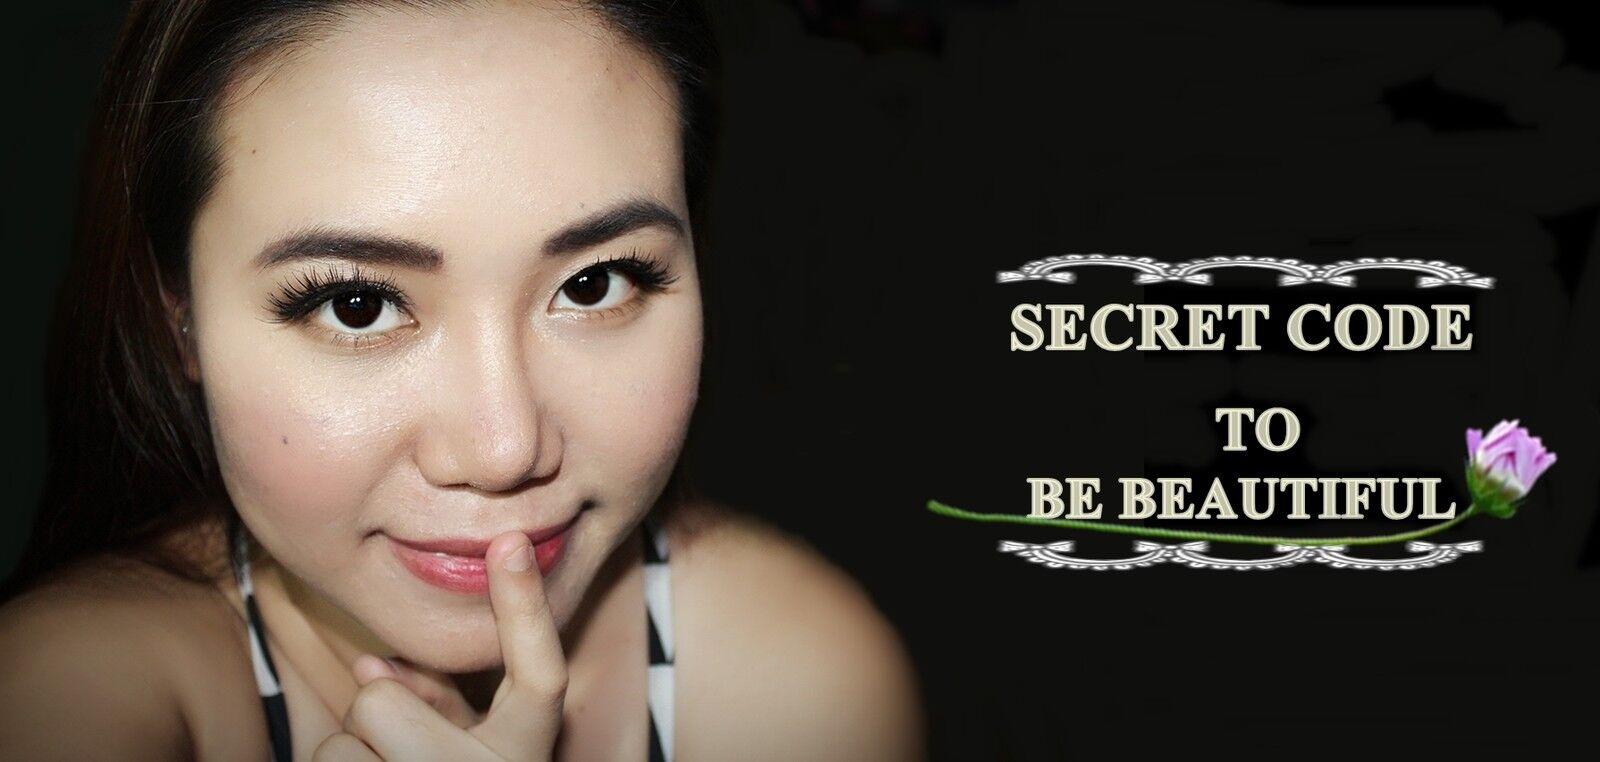 Secret Code to Be Beautiful